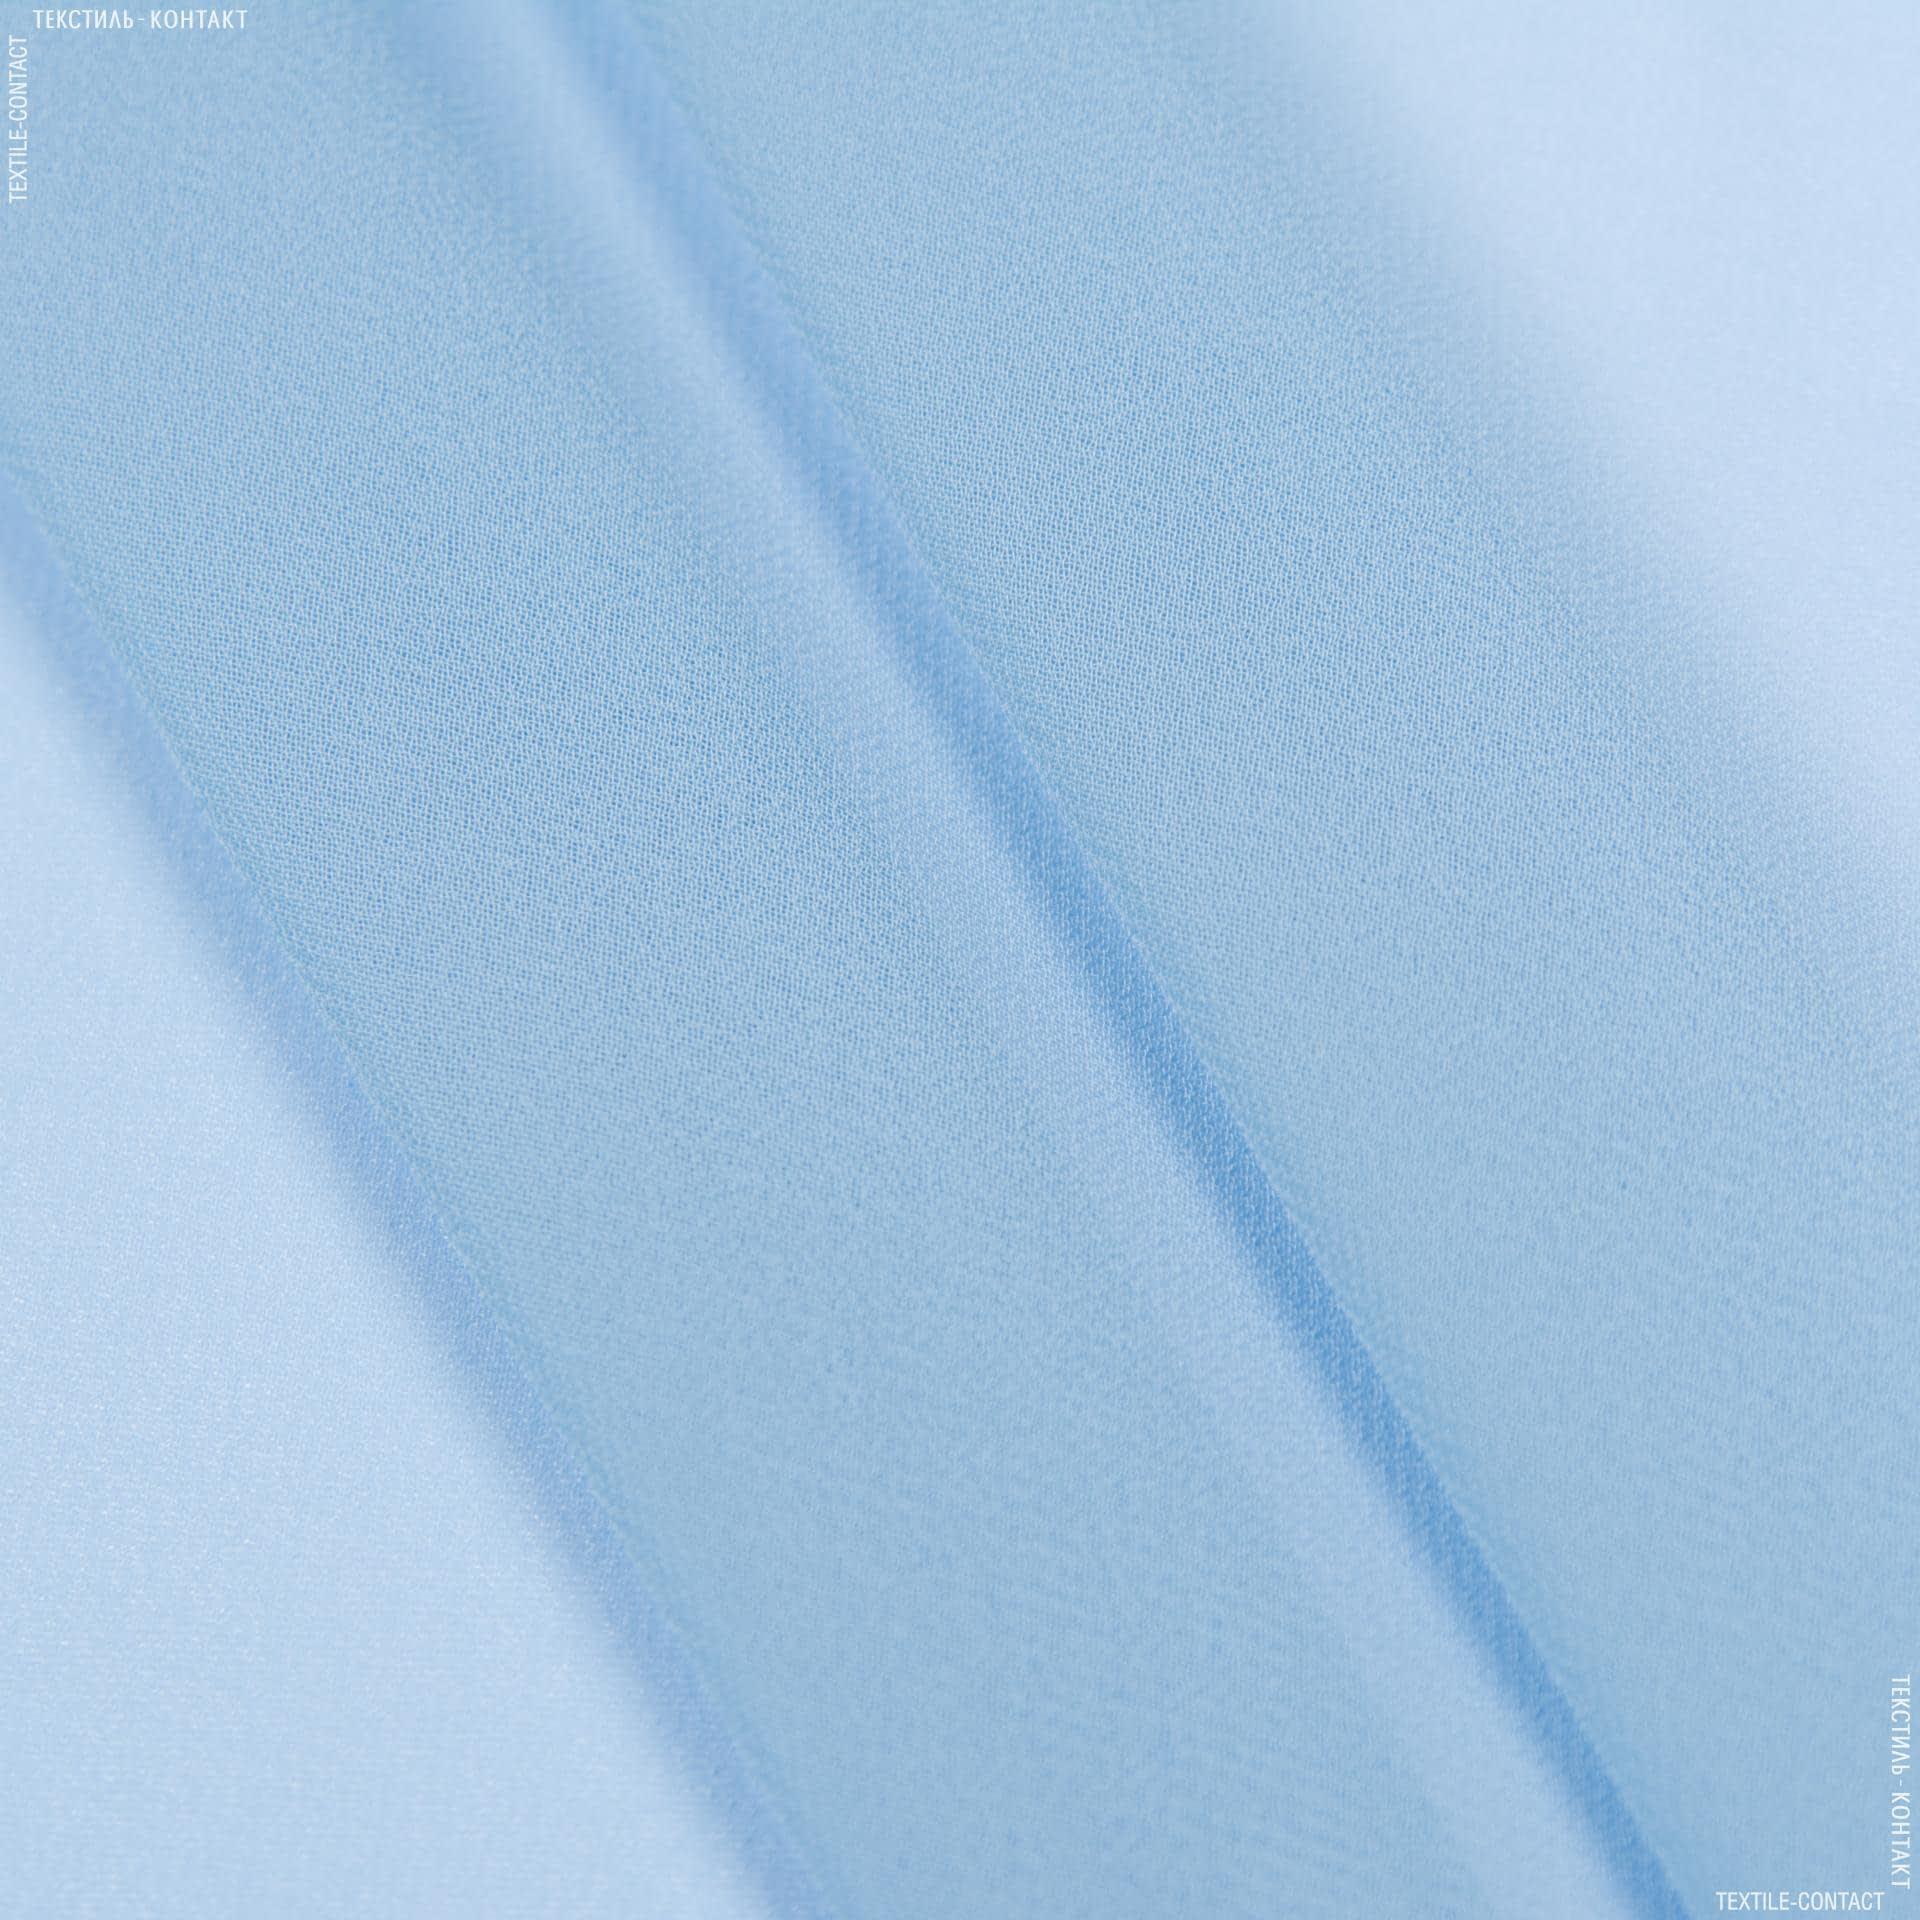 Ткани для платков и бандан - Шифон мульти голубой